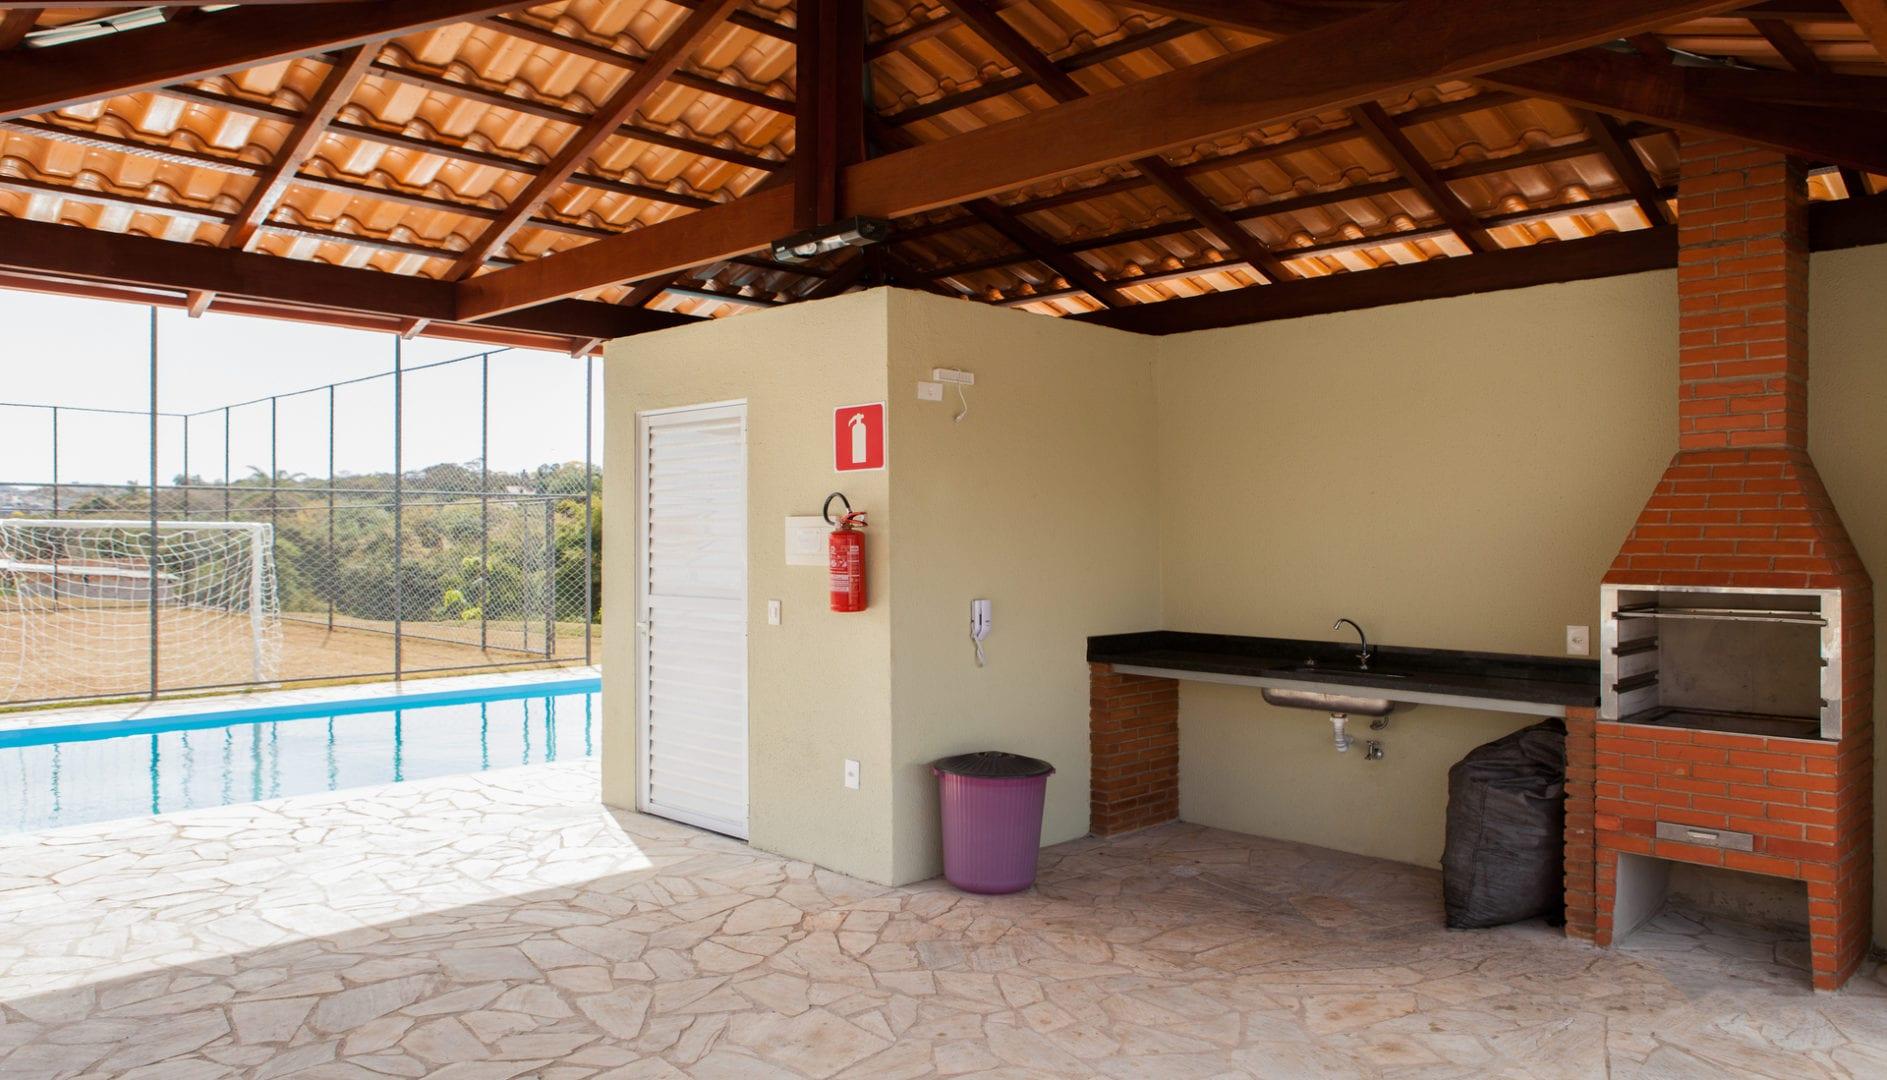 Villa Bella Mônaco - Villa Bella Monaco_300dpi208-Edit